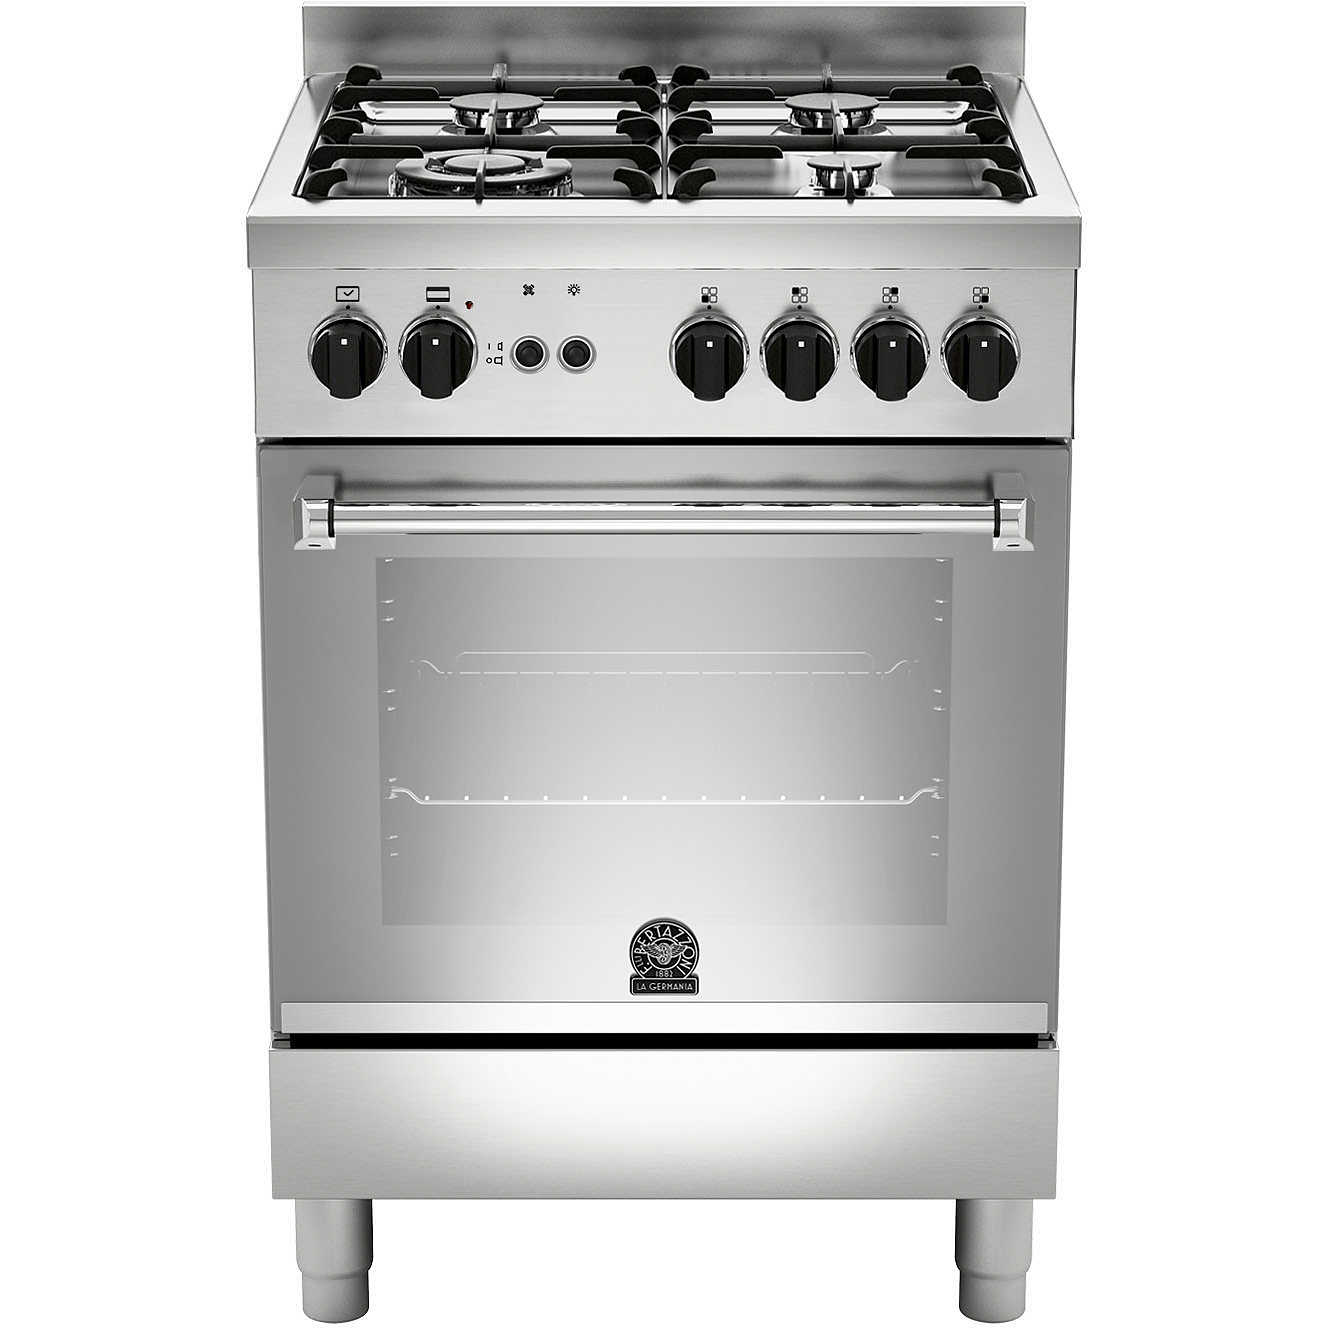 La germania amn604gevsxc cucina 60x60 4 fuochi a gas forno gas ventilato con grill elettrico 56 - Cucina con forno a gas ventilato ...